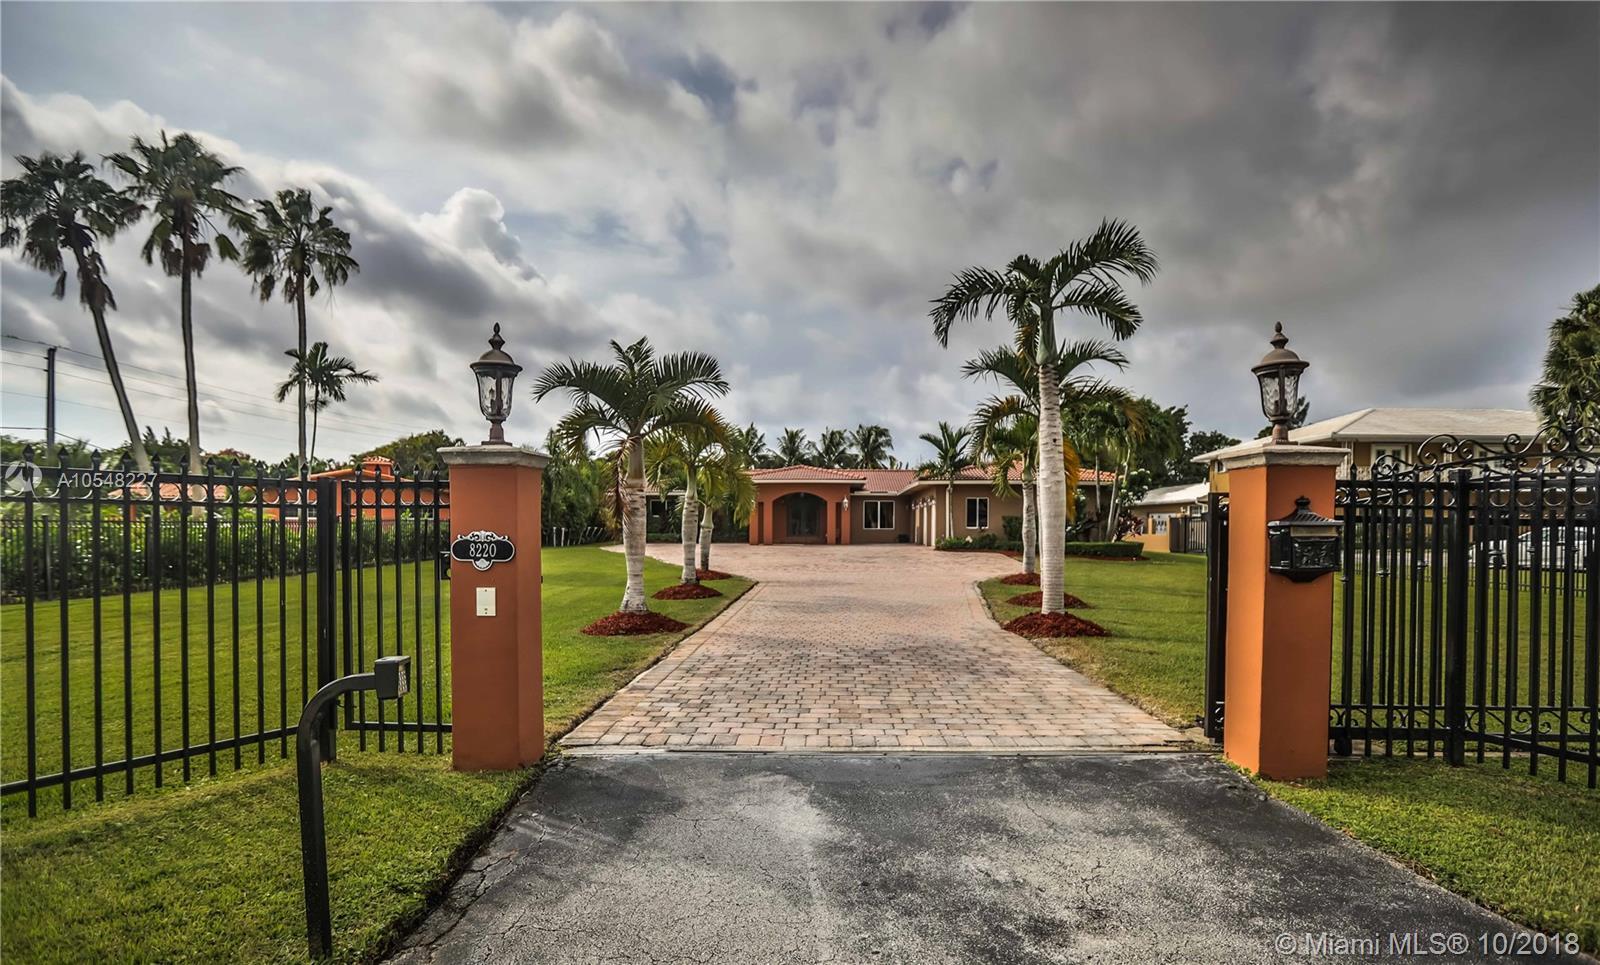 South Miami - 8220 Miller Dr, Miami, FL 33155